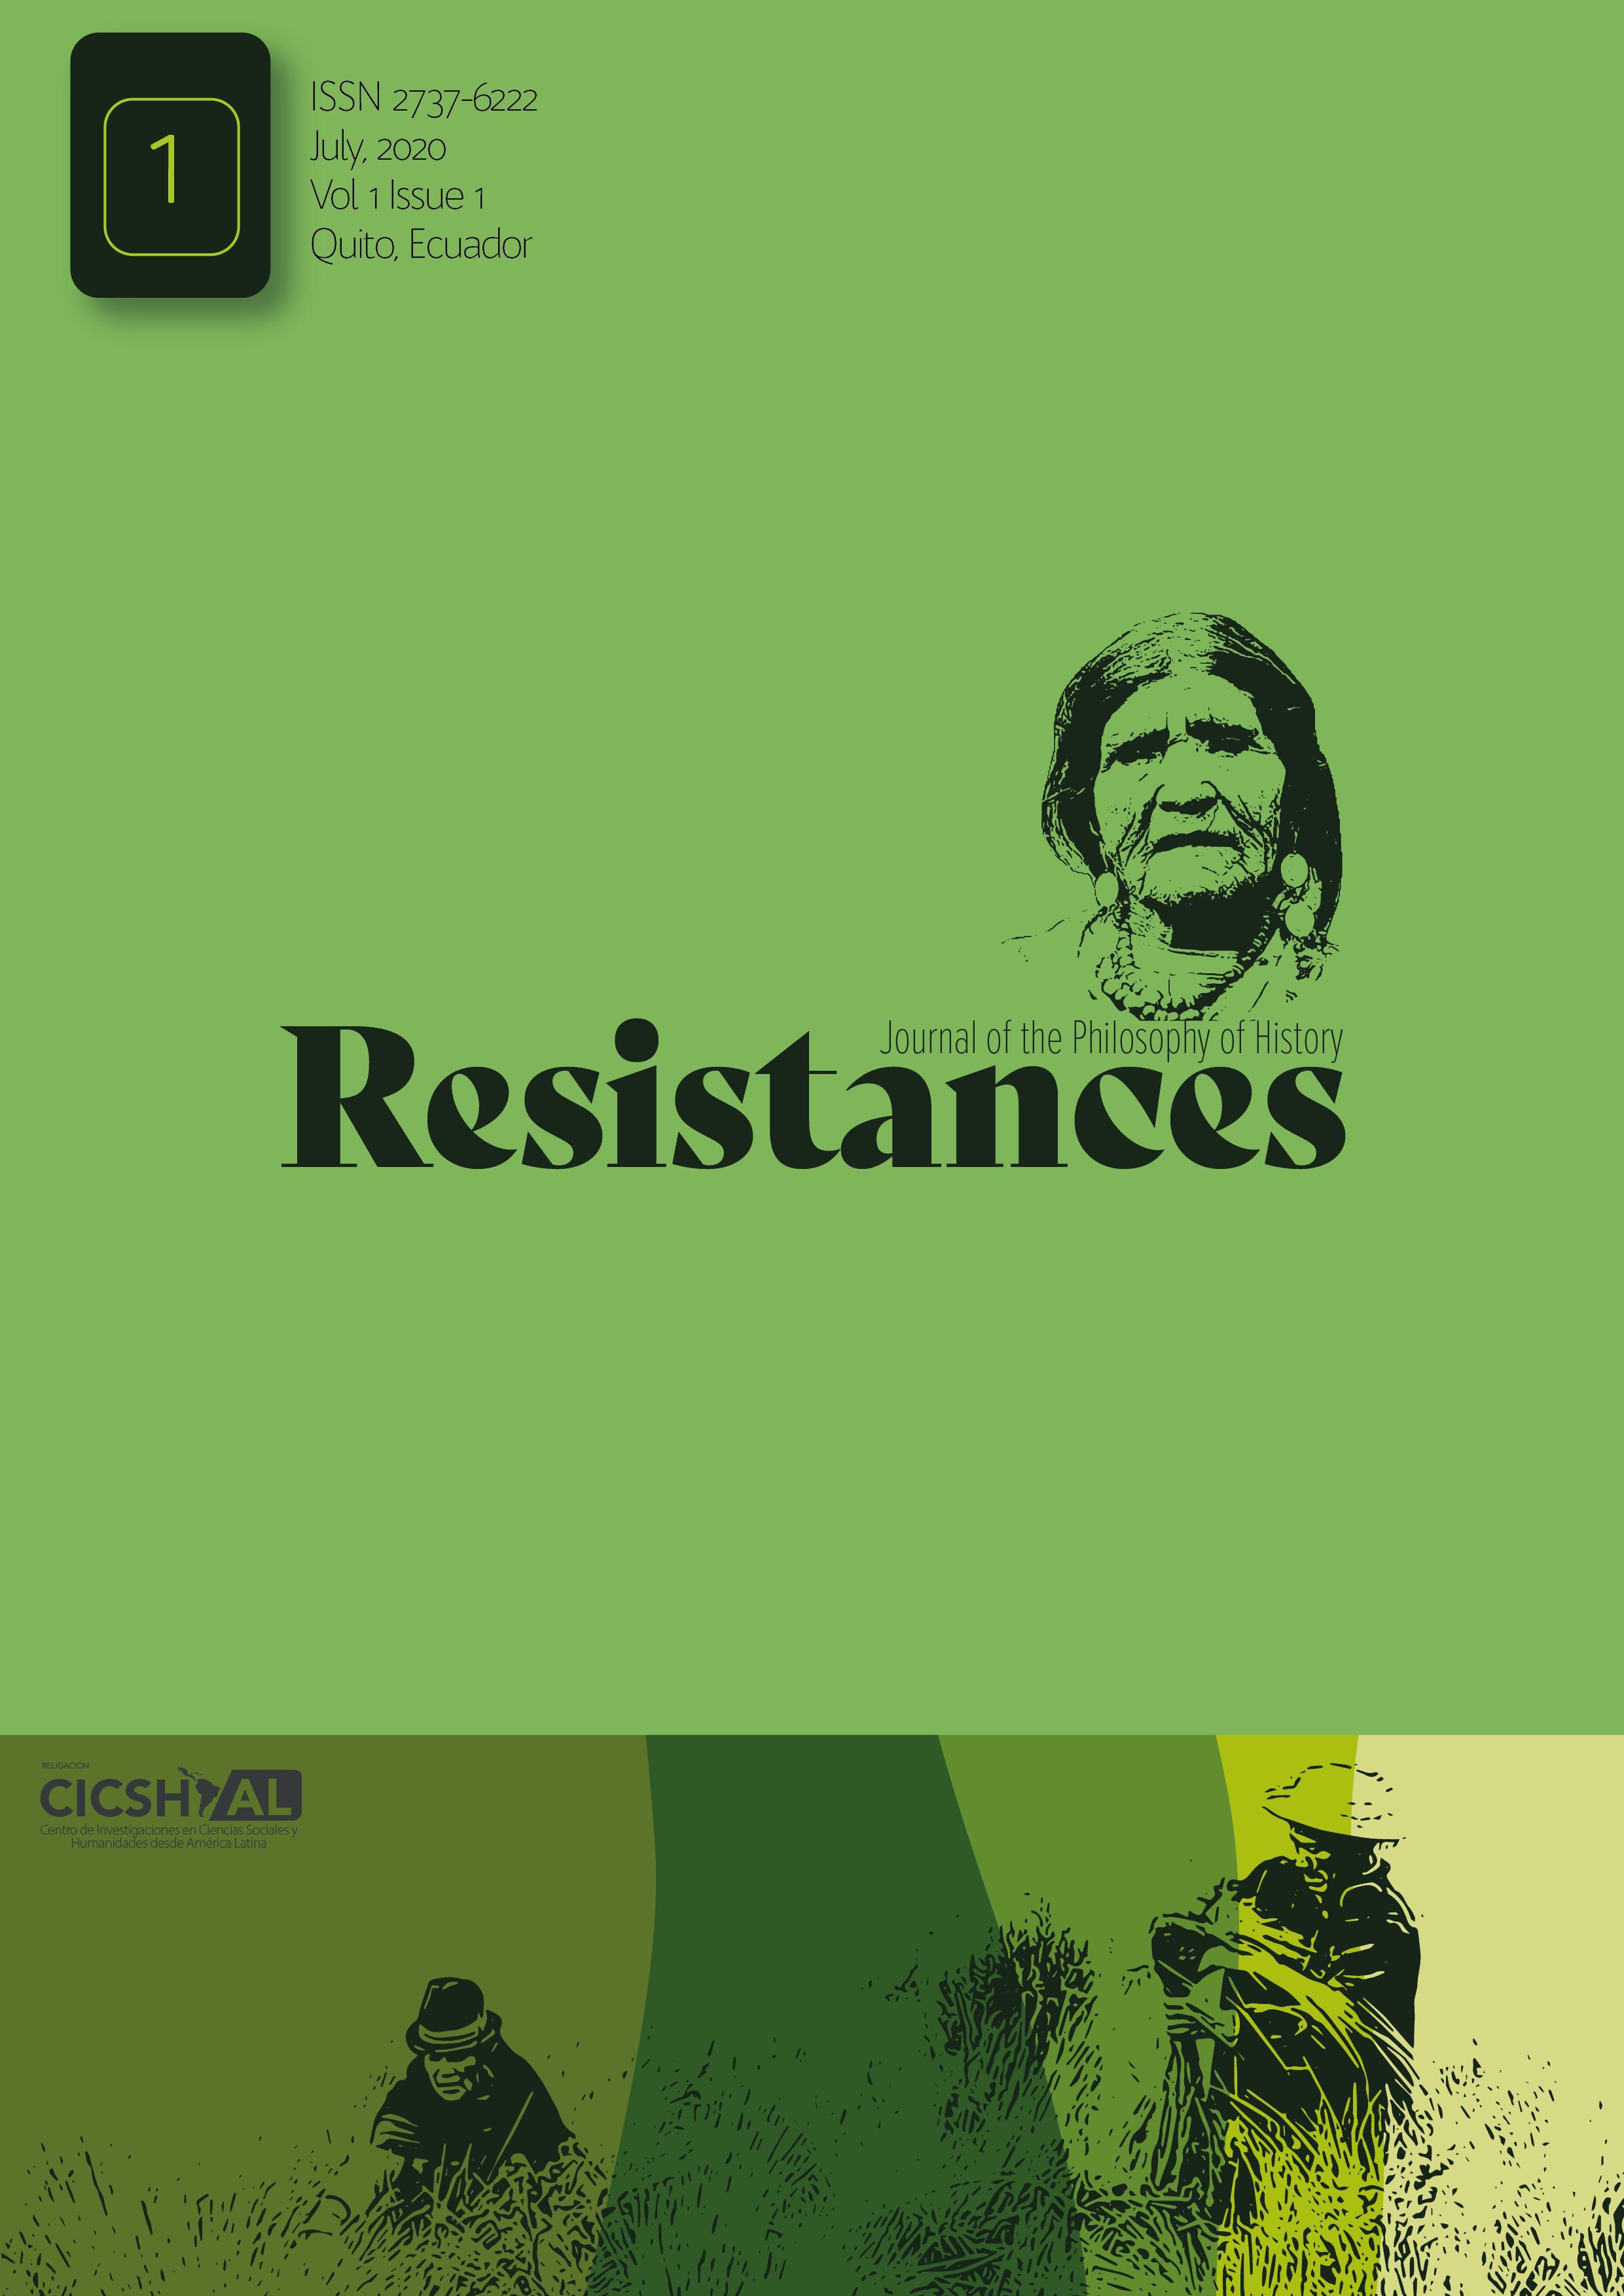 RESISTANCES JOURNAL